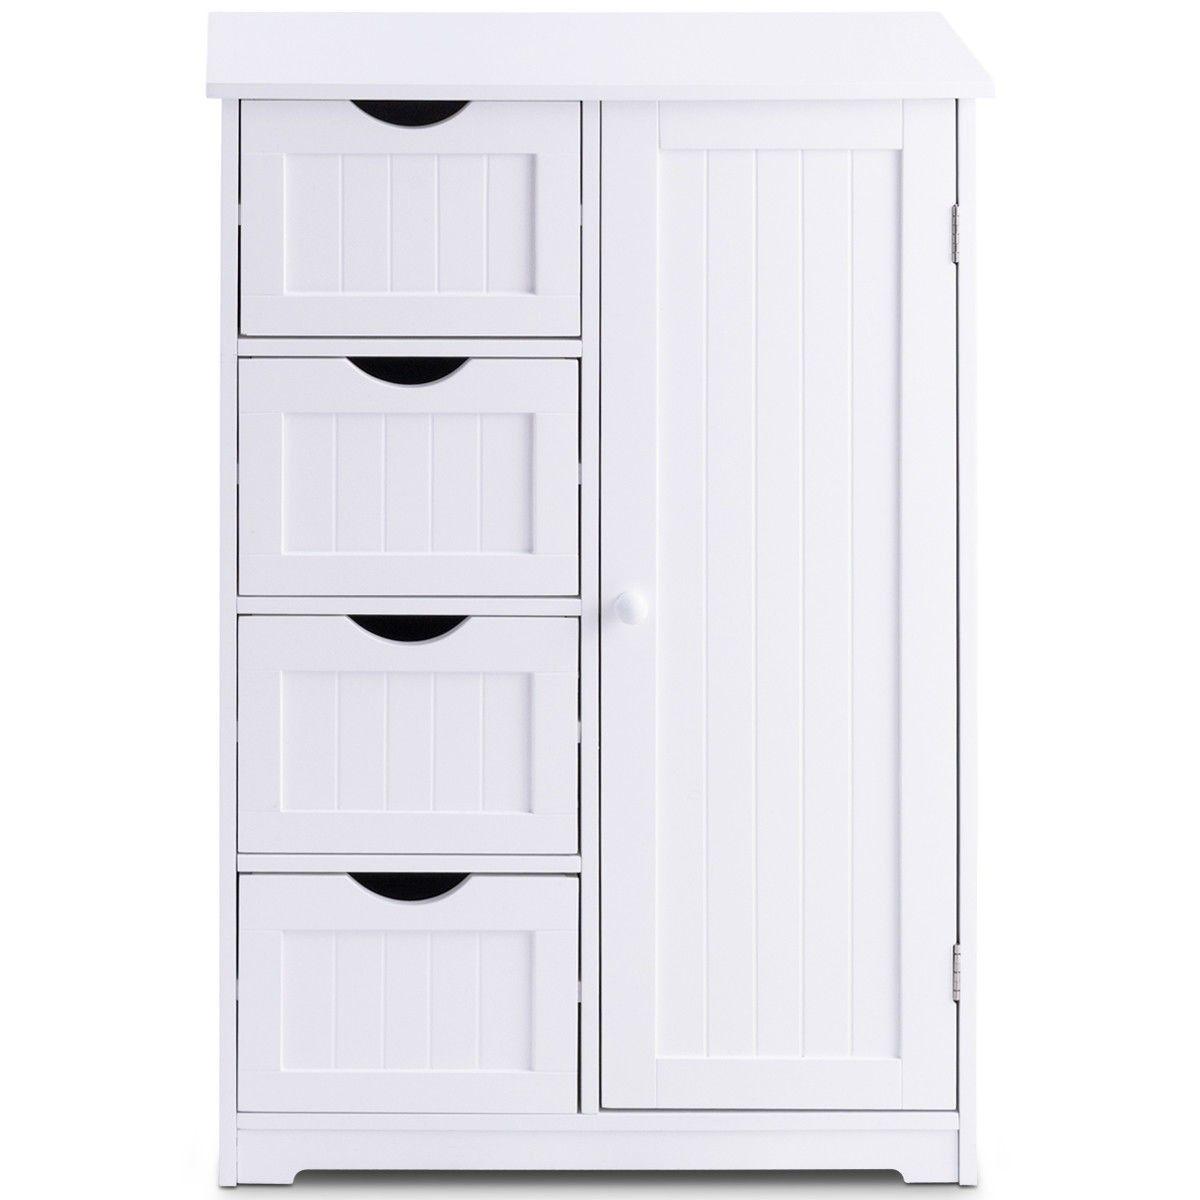 Standing Indoor Wooden Cabinet With 4 Drawers Bathroom Storage